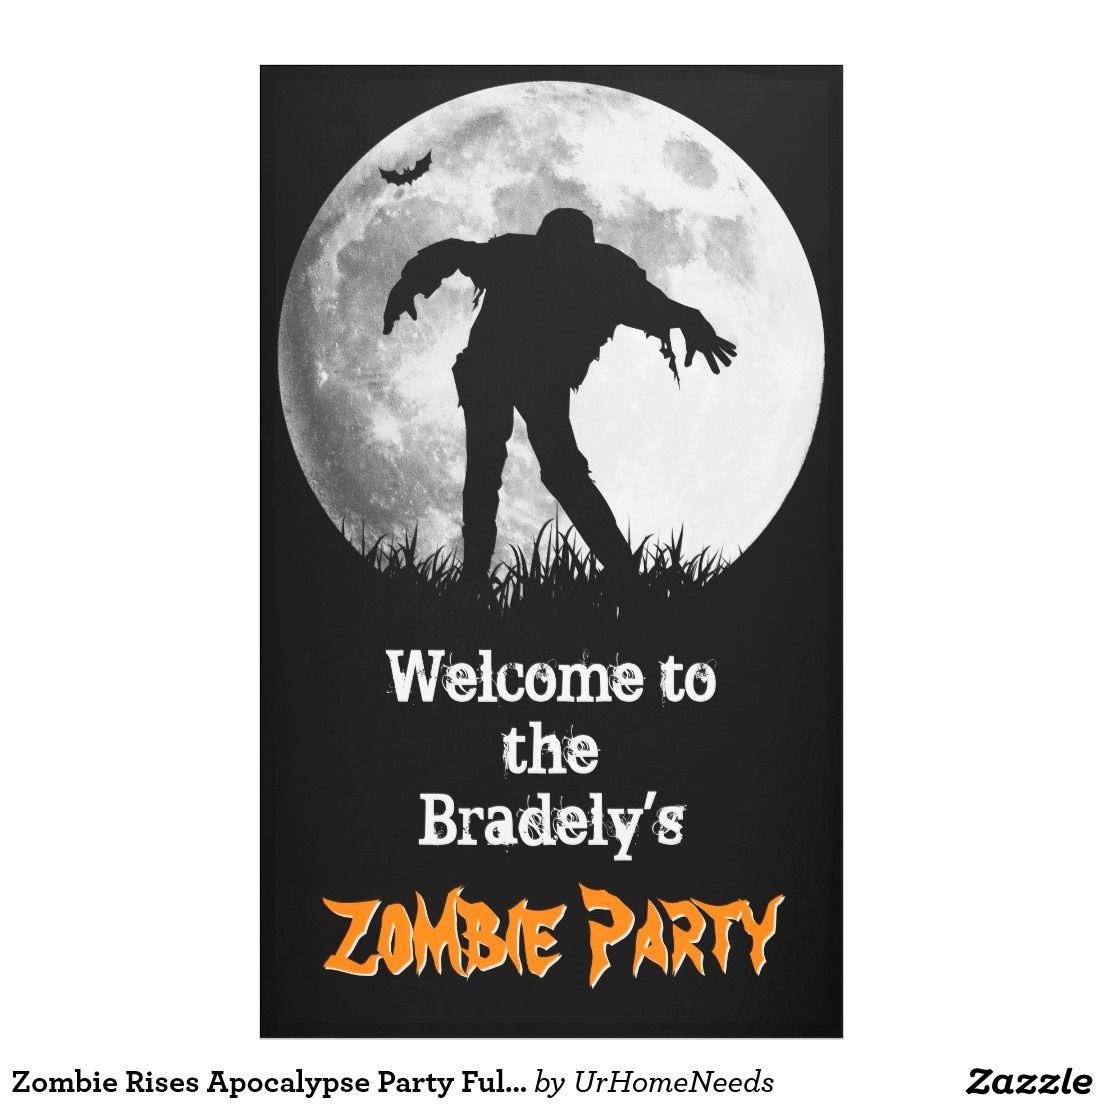 Zombie Rises Apocalypse Party Full Moon Halloween Banner   Zombies ...